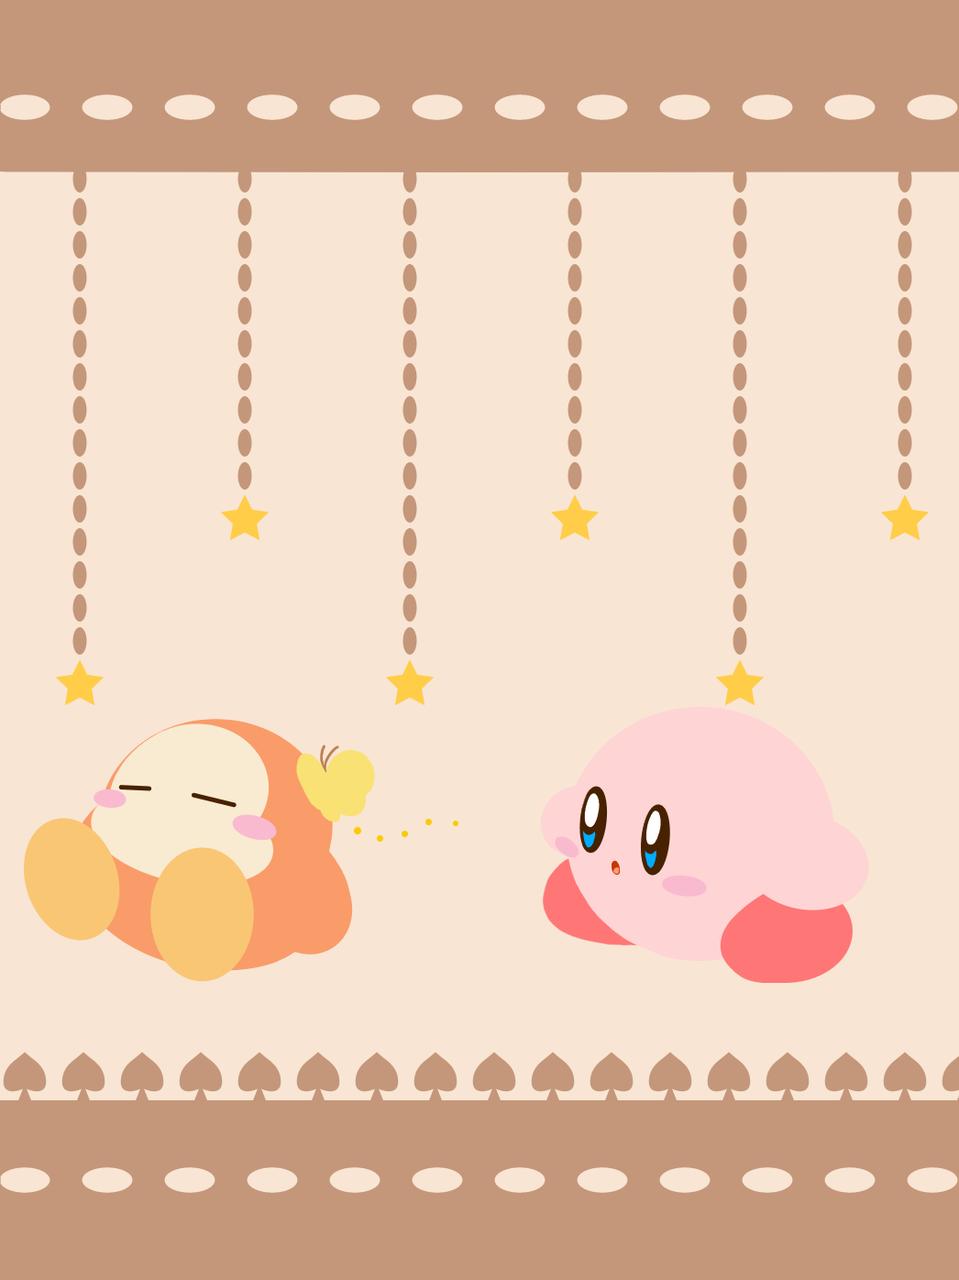 ☆ Illust of popo sky medibangpaint Kirby'sDreamLand